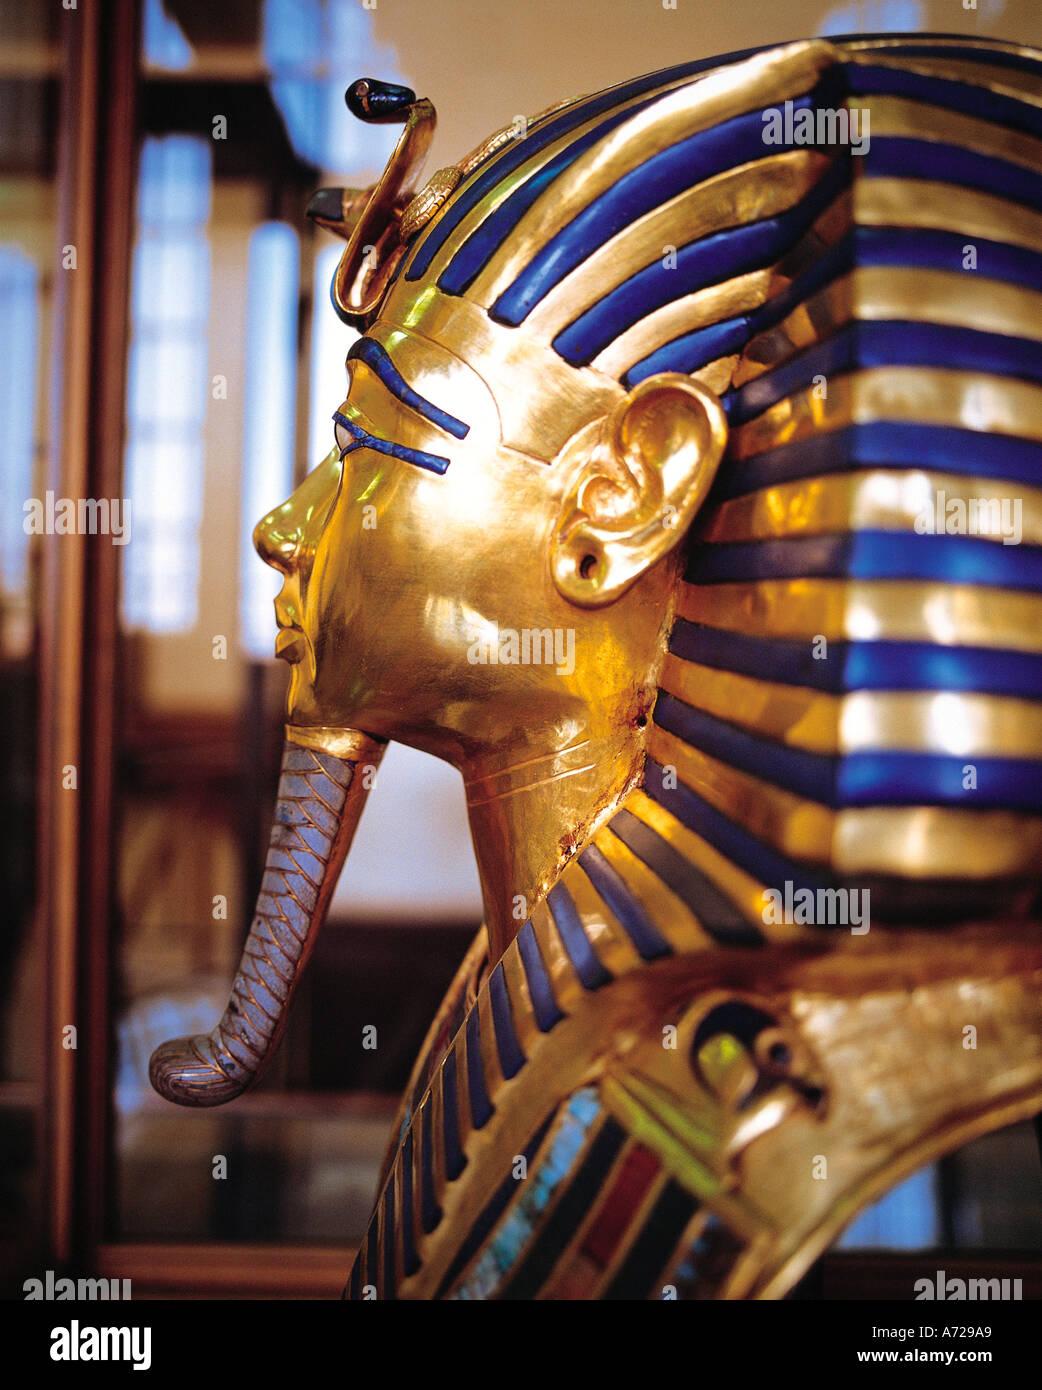 Tutankhamun Death Mask in the Cairo Museum Cairo Egypt - Stock Image